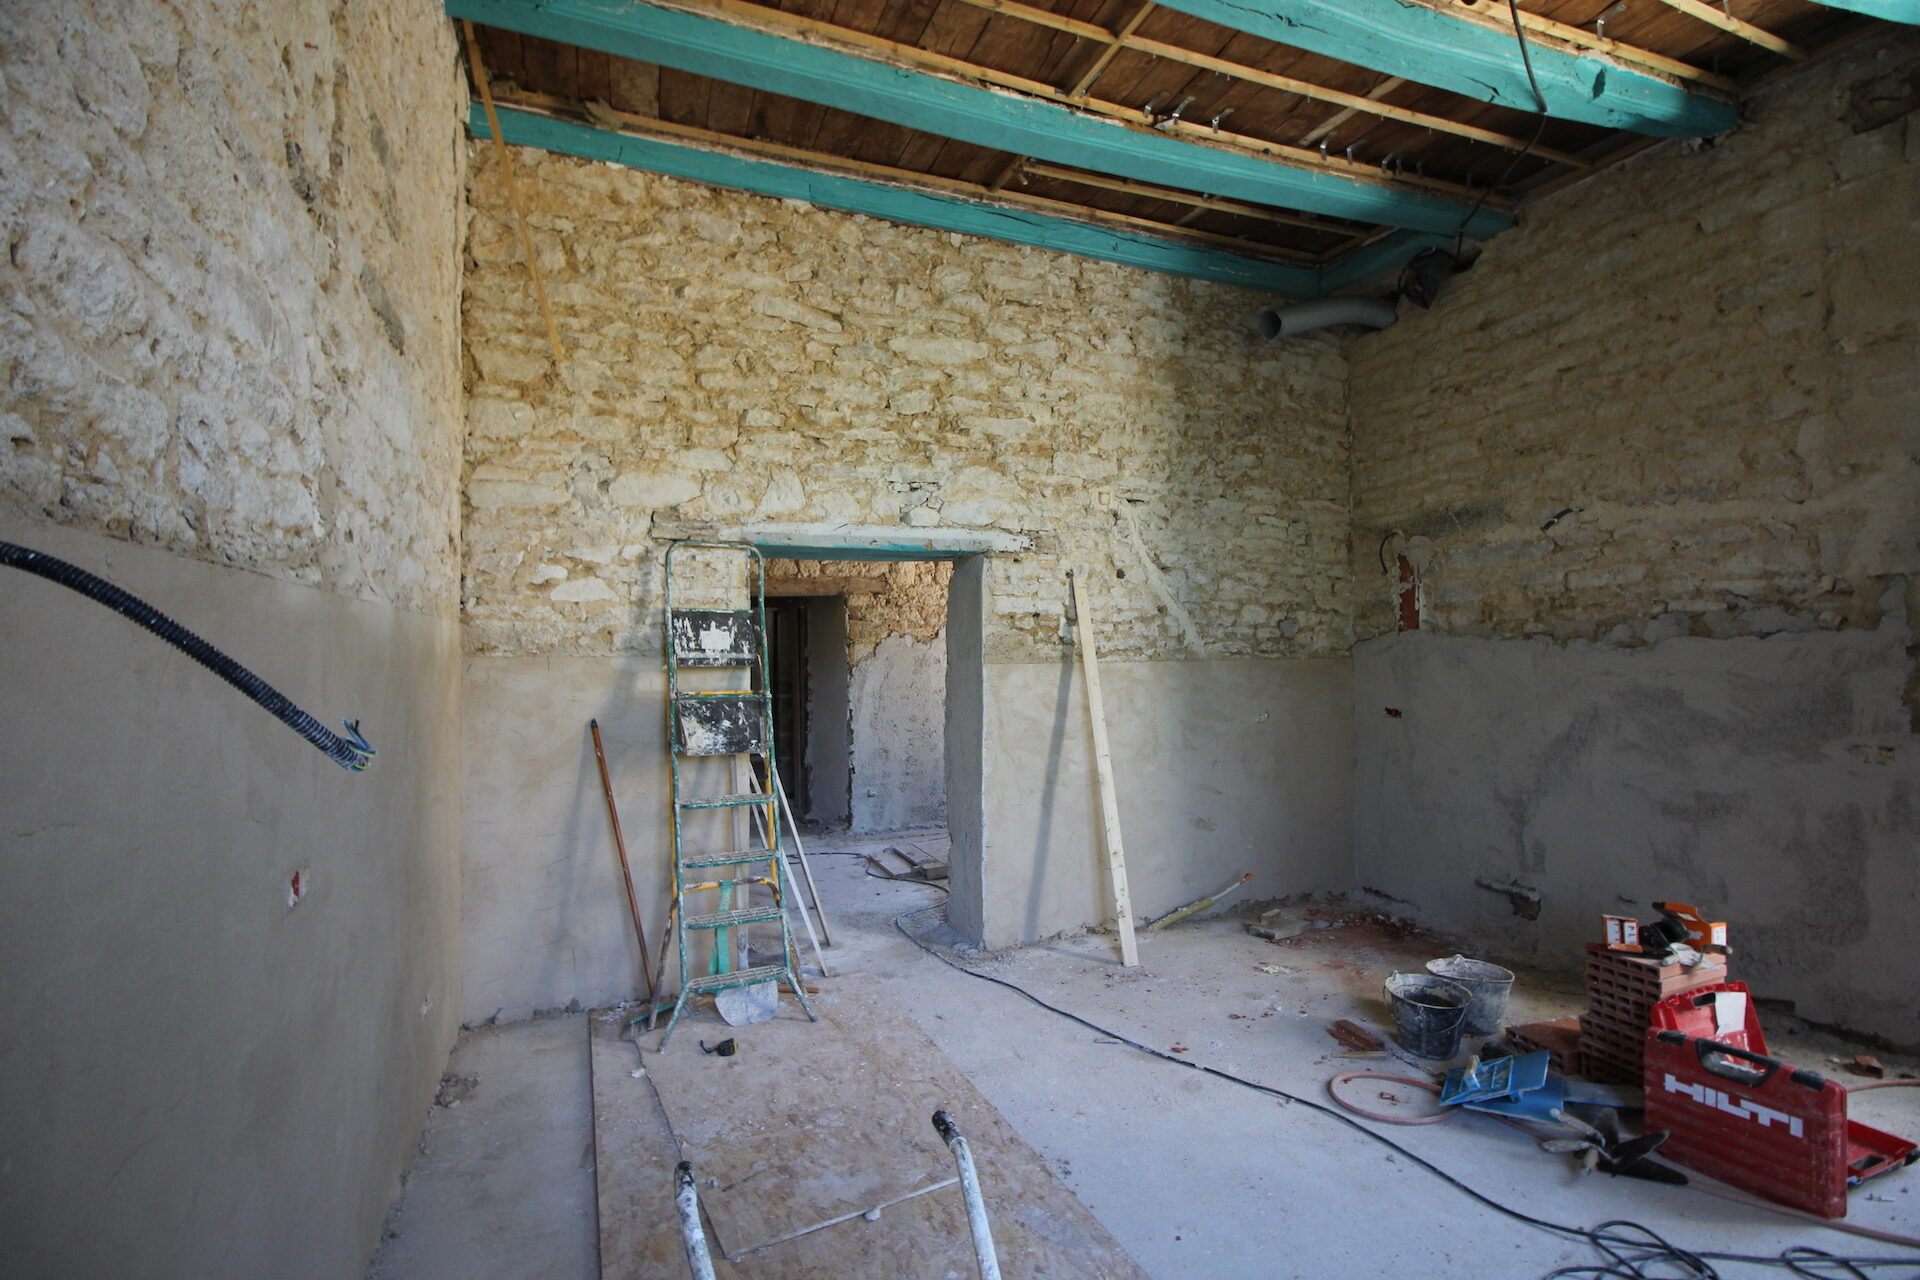 CSDK Lissage de murs en terre Bretagne 6 1920x1280 - Engagement durable - CSDK Lissage de murs en terre Bretagne 6 1920x1280